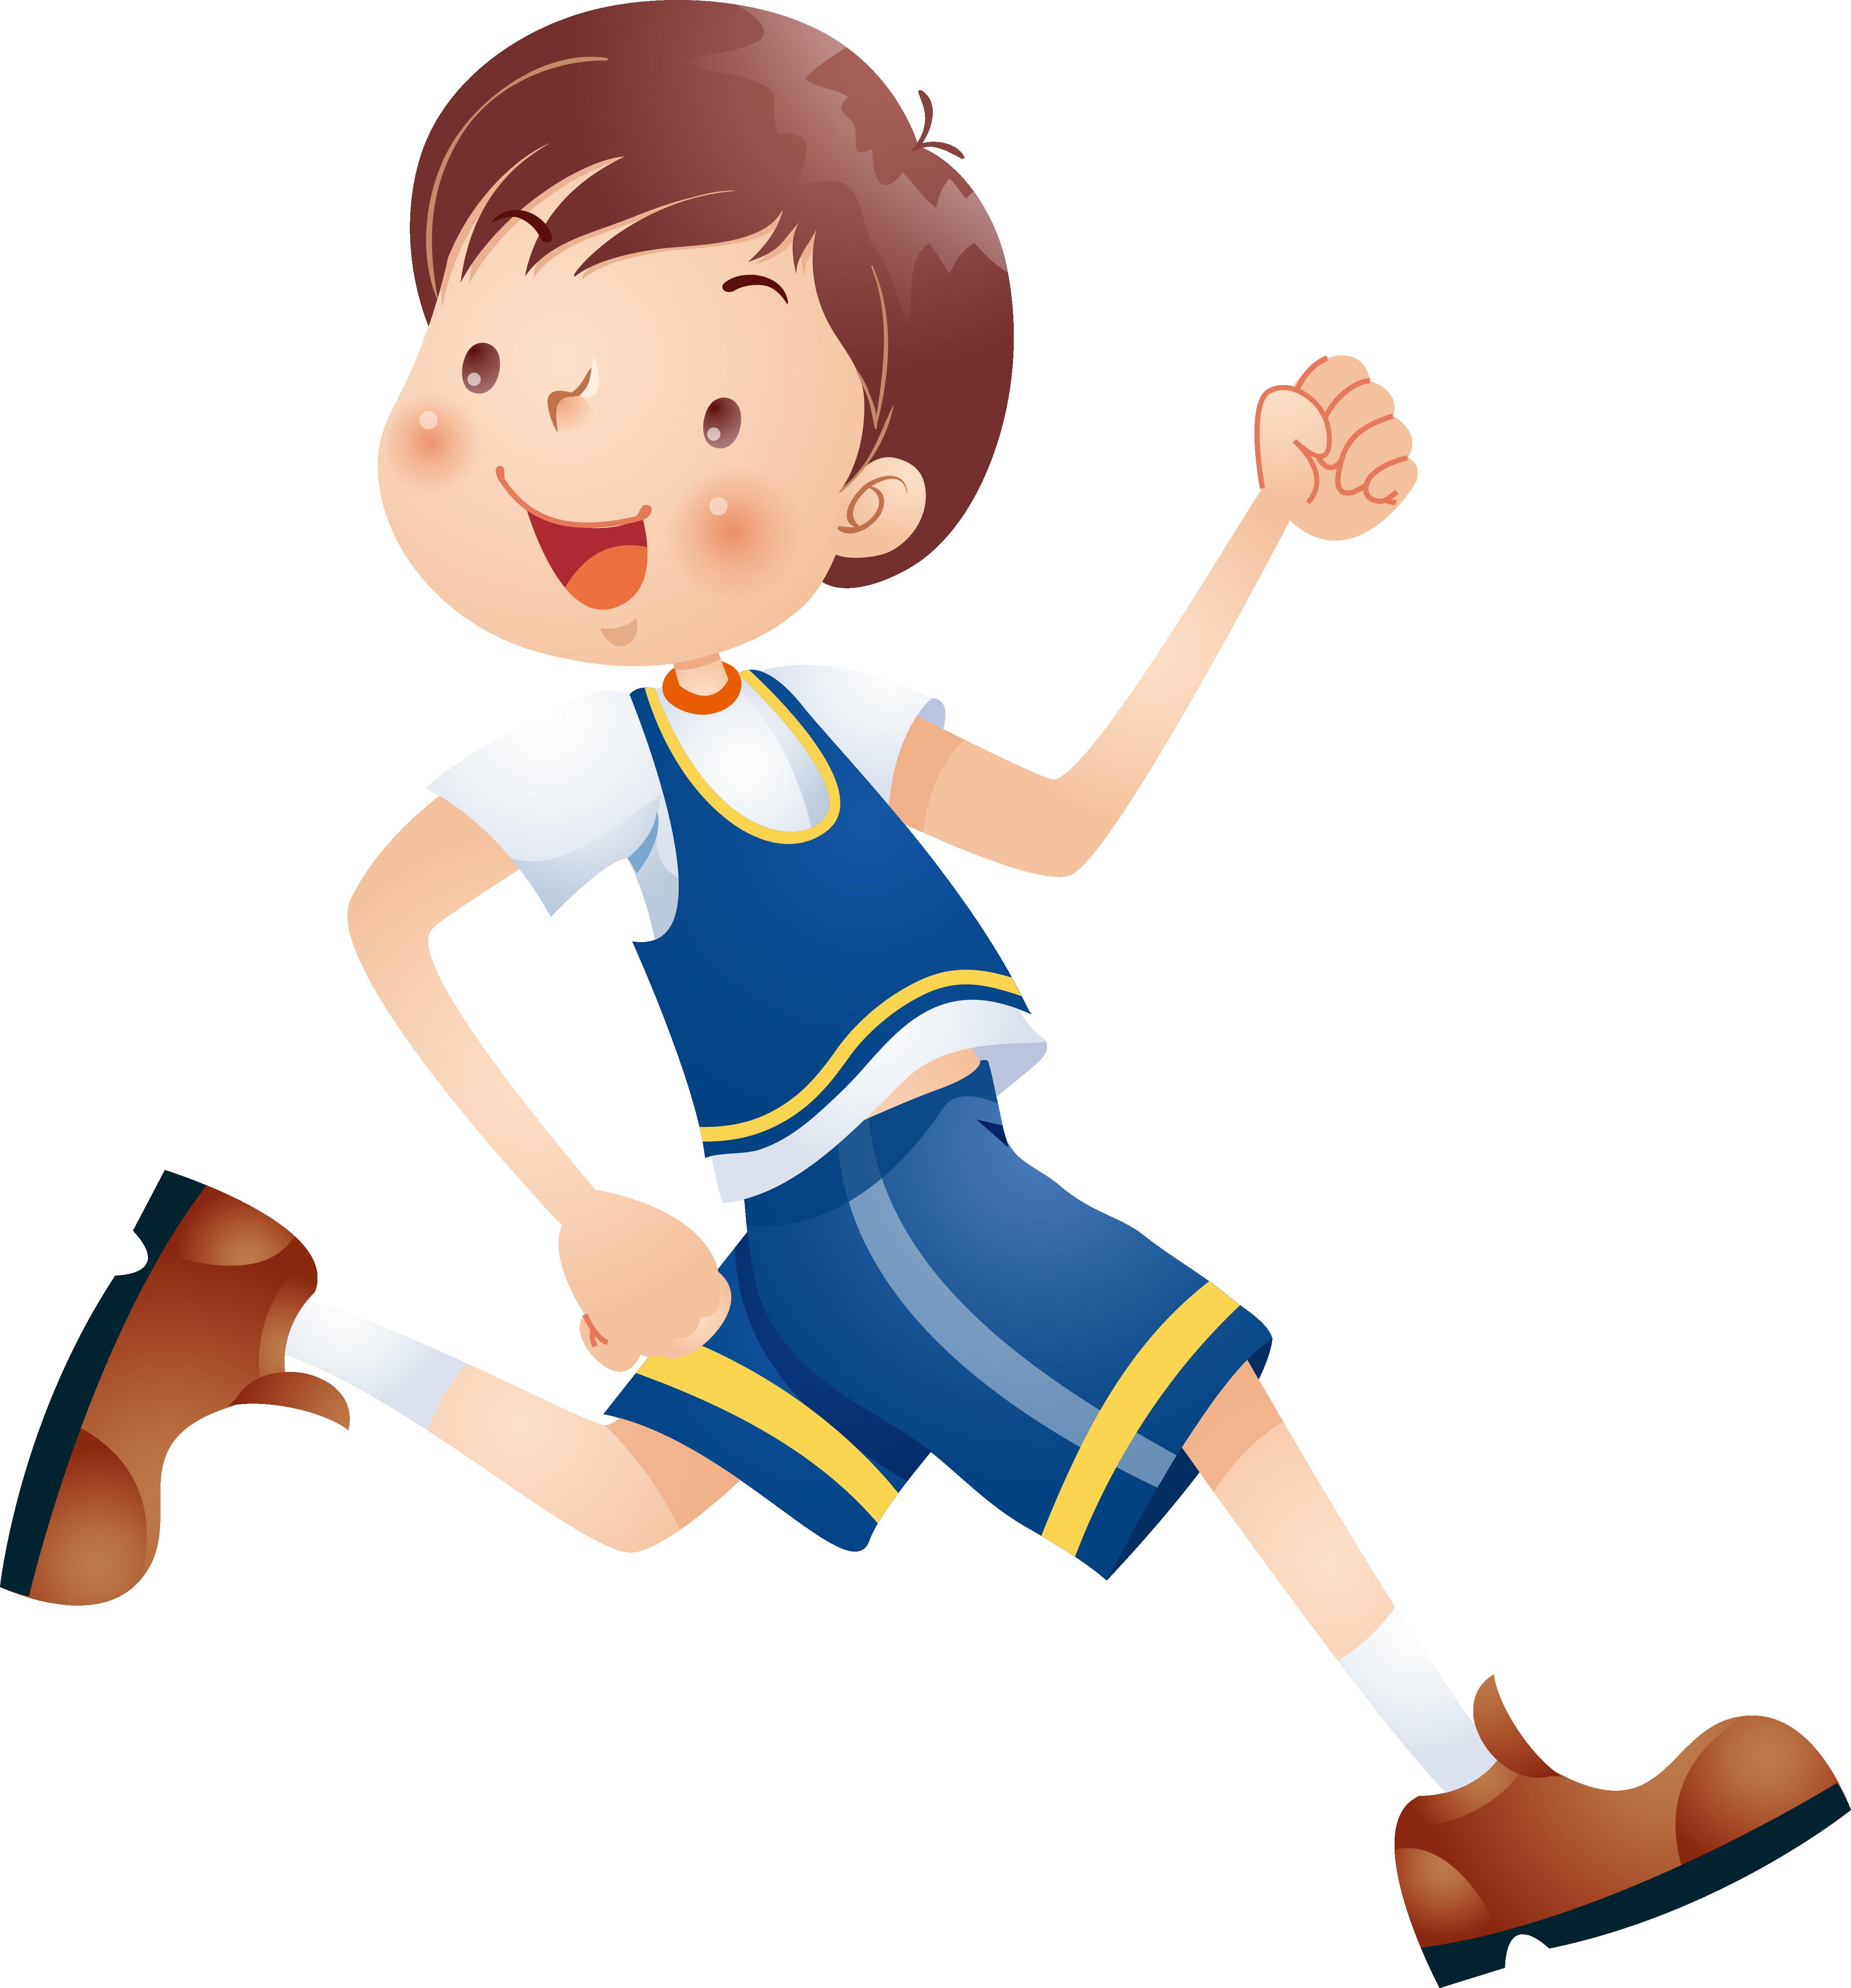 Child Cartoon Clip art - Running kids png download - 4729 ...